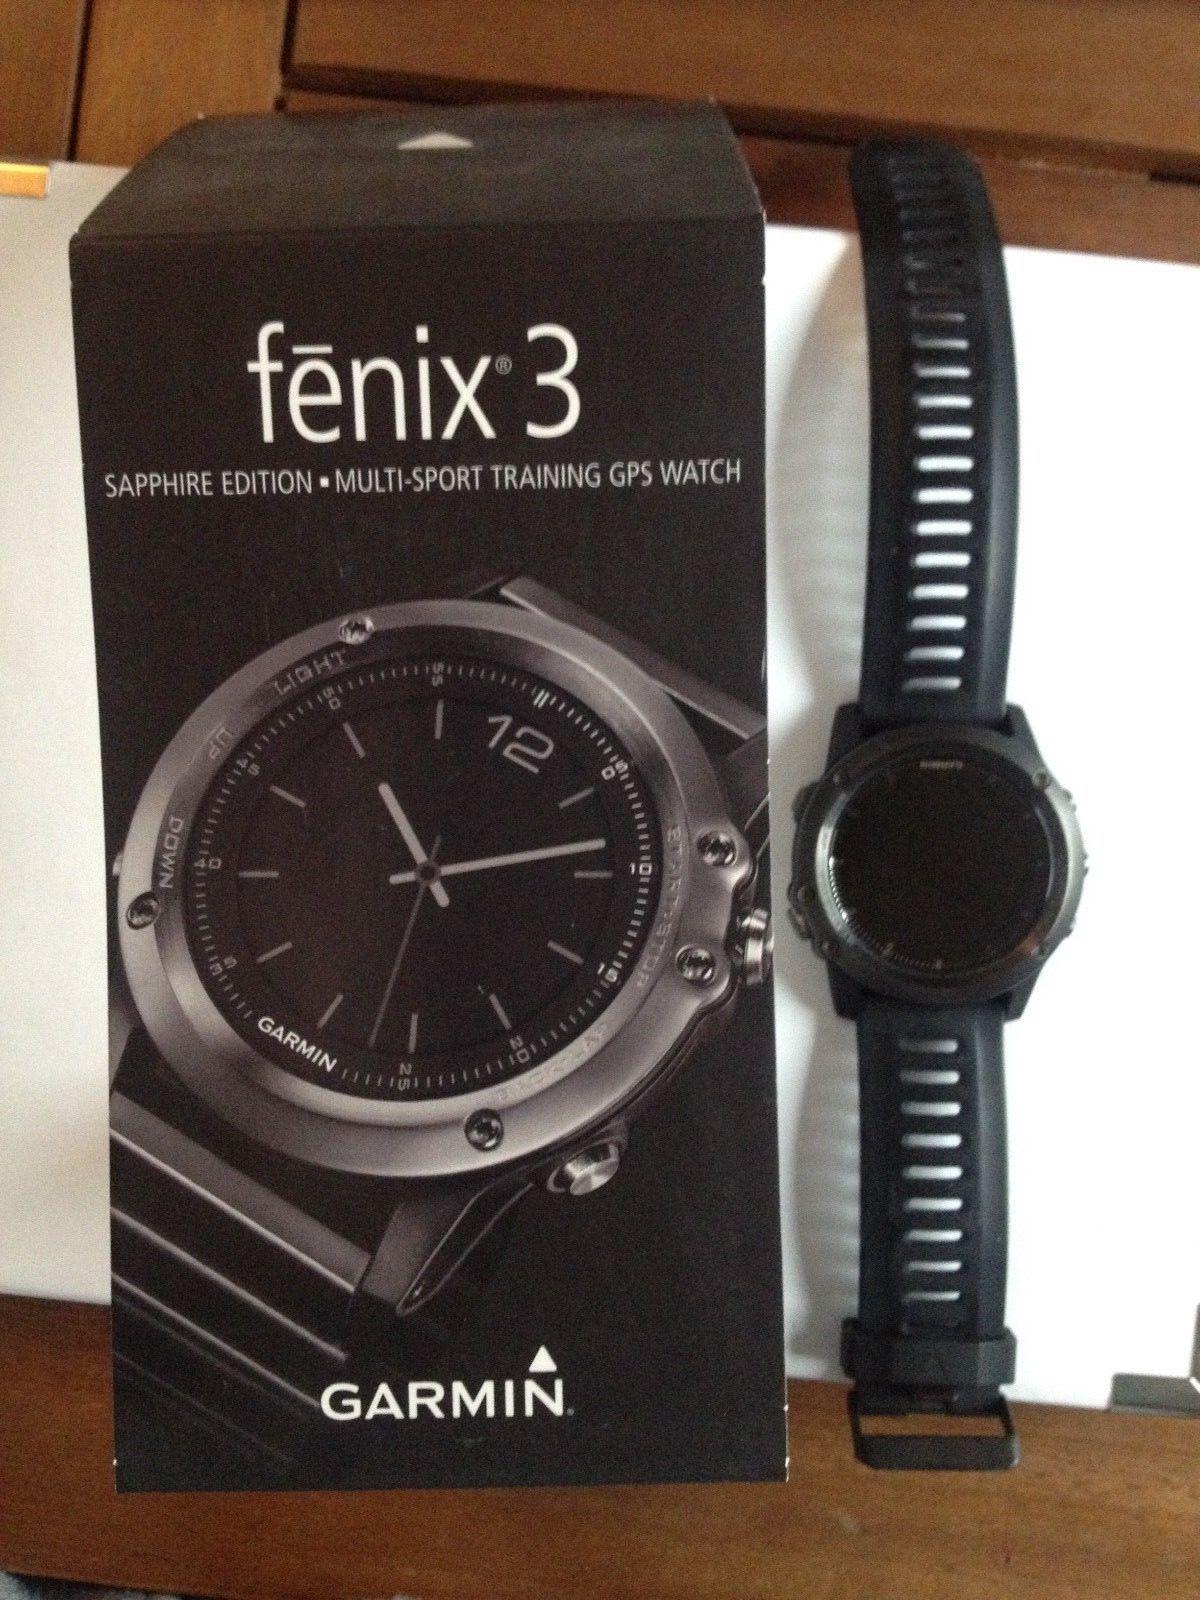 Garmin fenix® 3 GPS-Multisport-Uhr, schwarz, Ersatzarmbänder